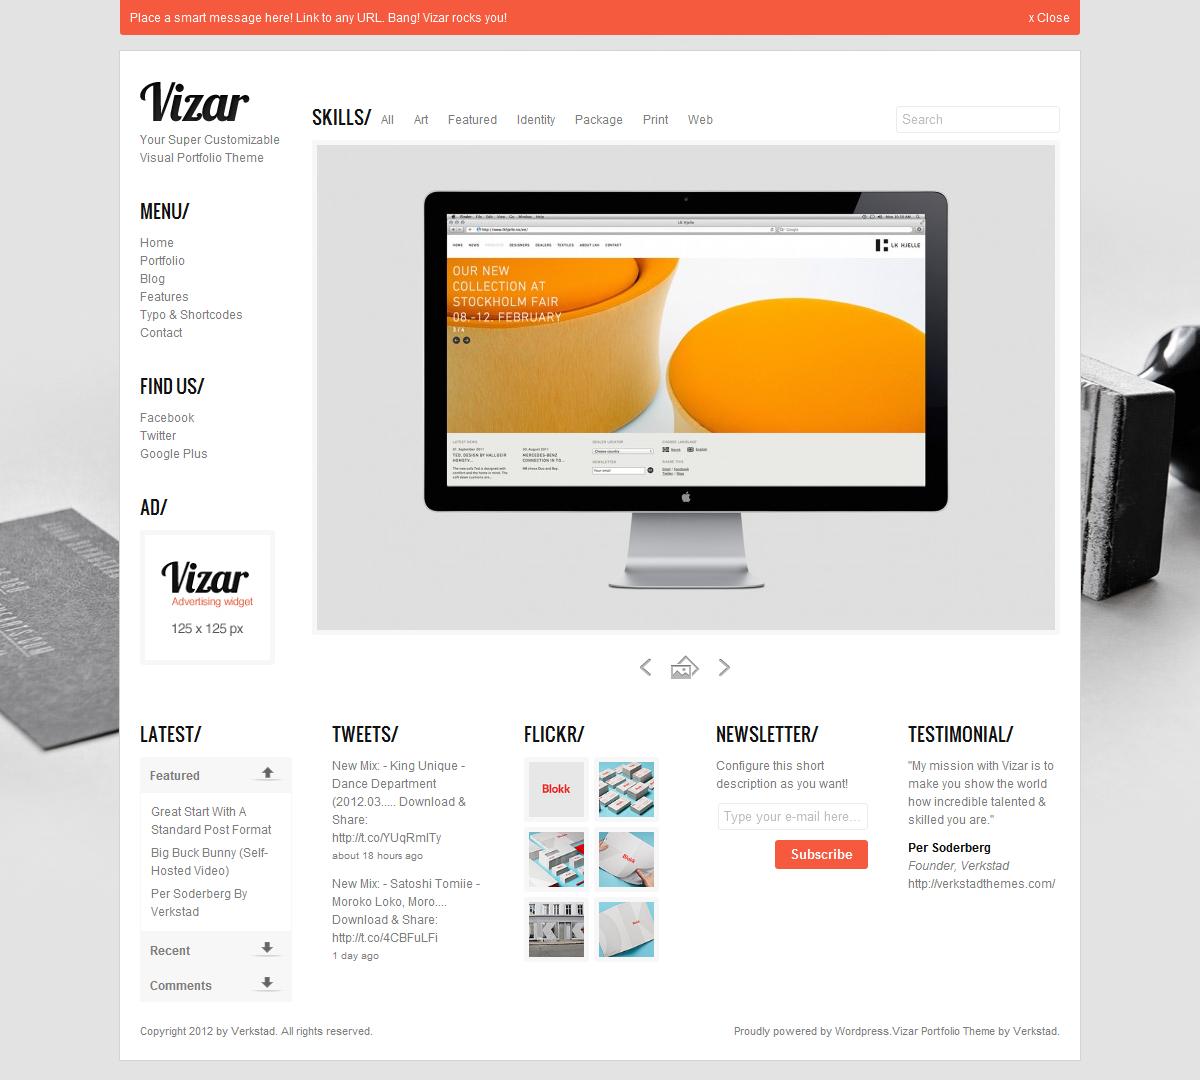 Vizar - Fully Customizable Visual Portfolio Theme